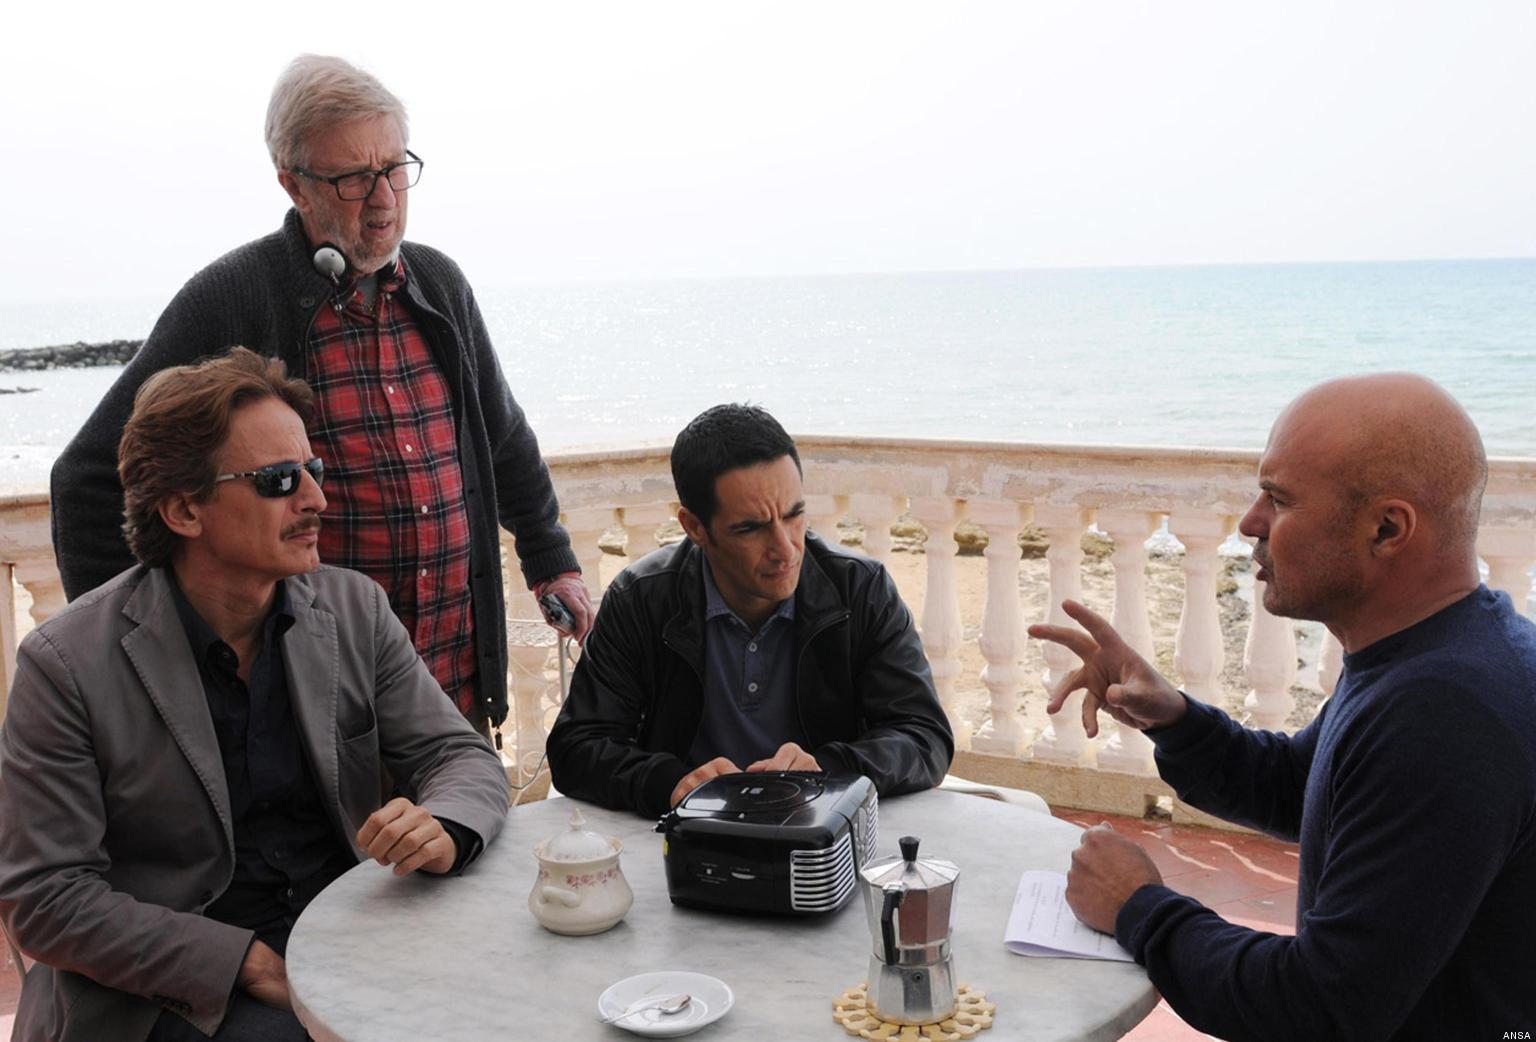 TV: RAI 1, I NUOVI EPISODI DEL COMMISSARIO MONTALBANO